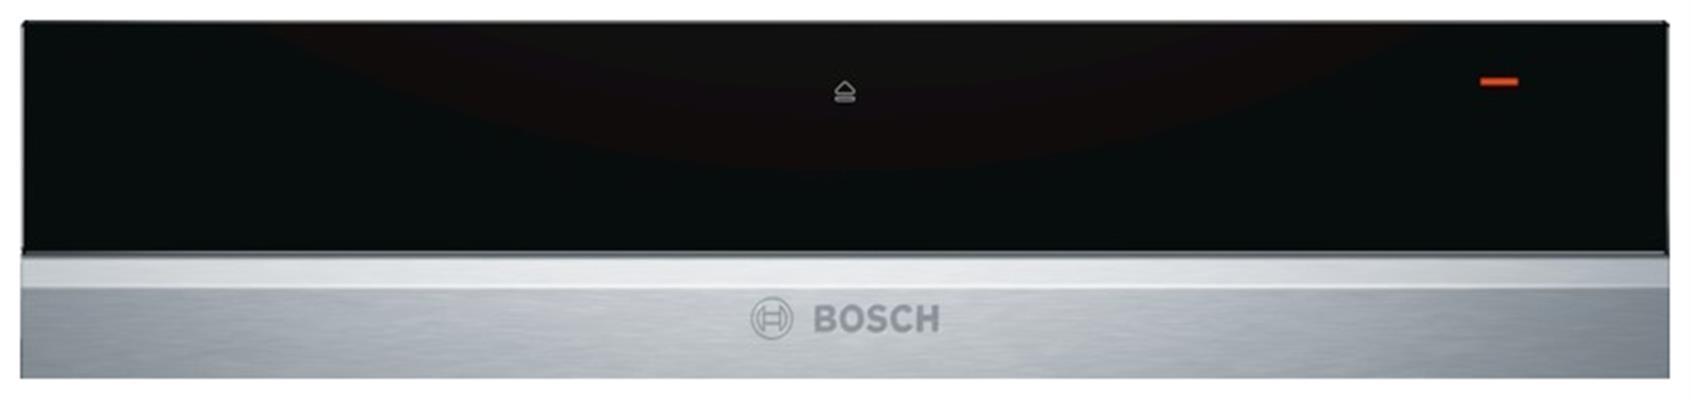 Bic630ns1 bosch warmhoudlade de beste prijs for Bosch apparatuur